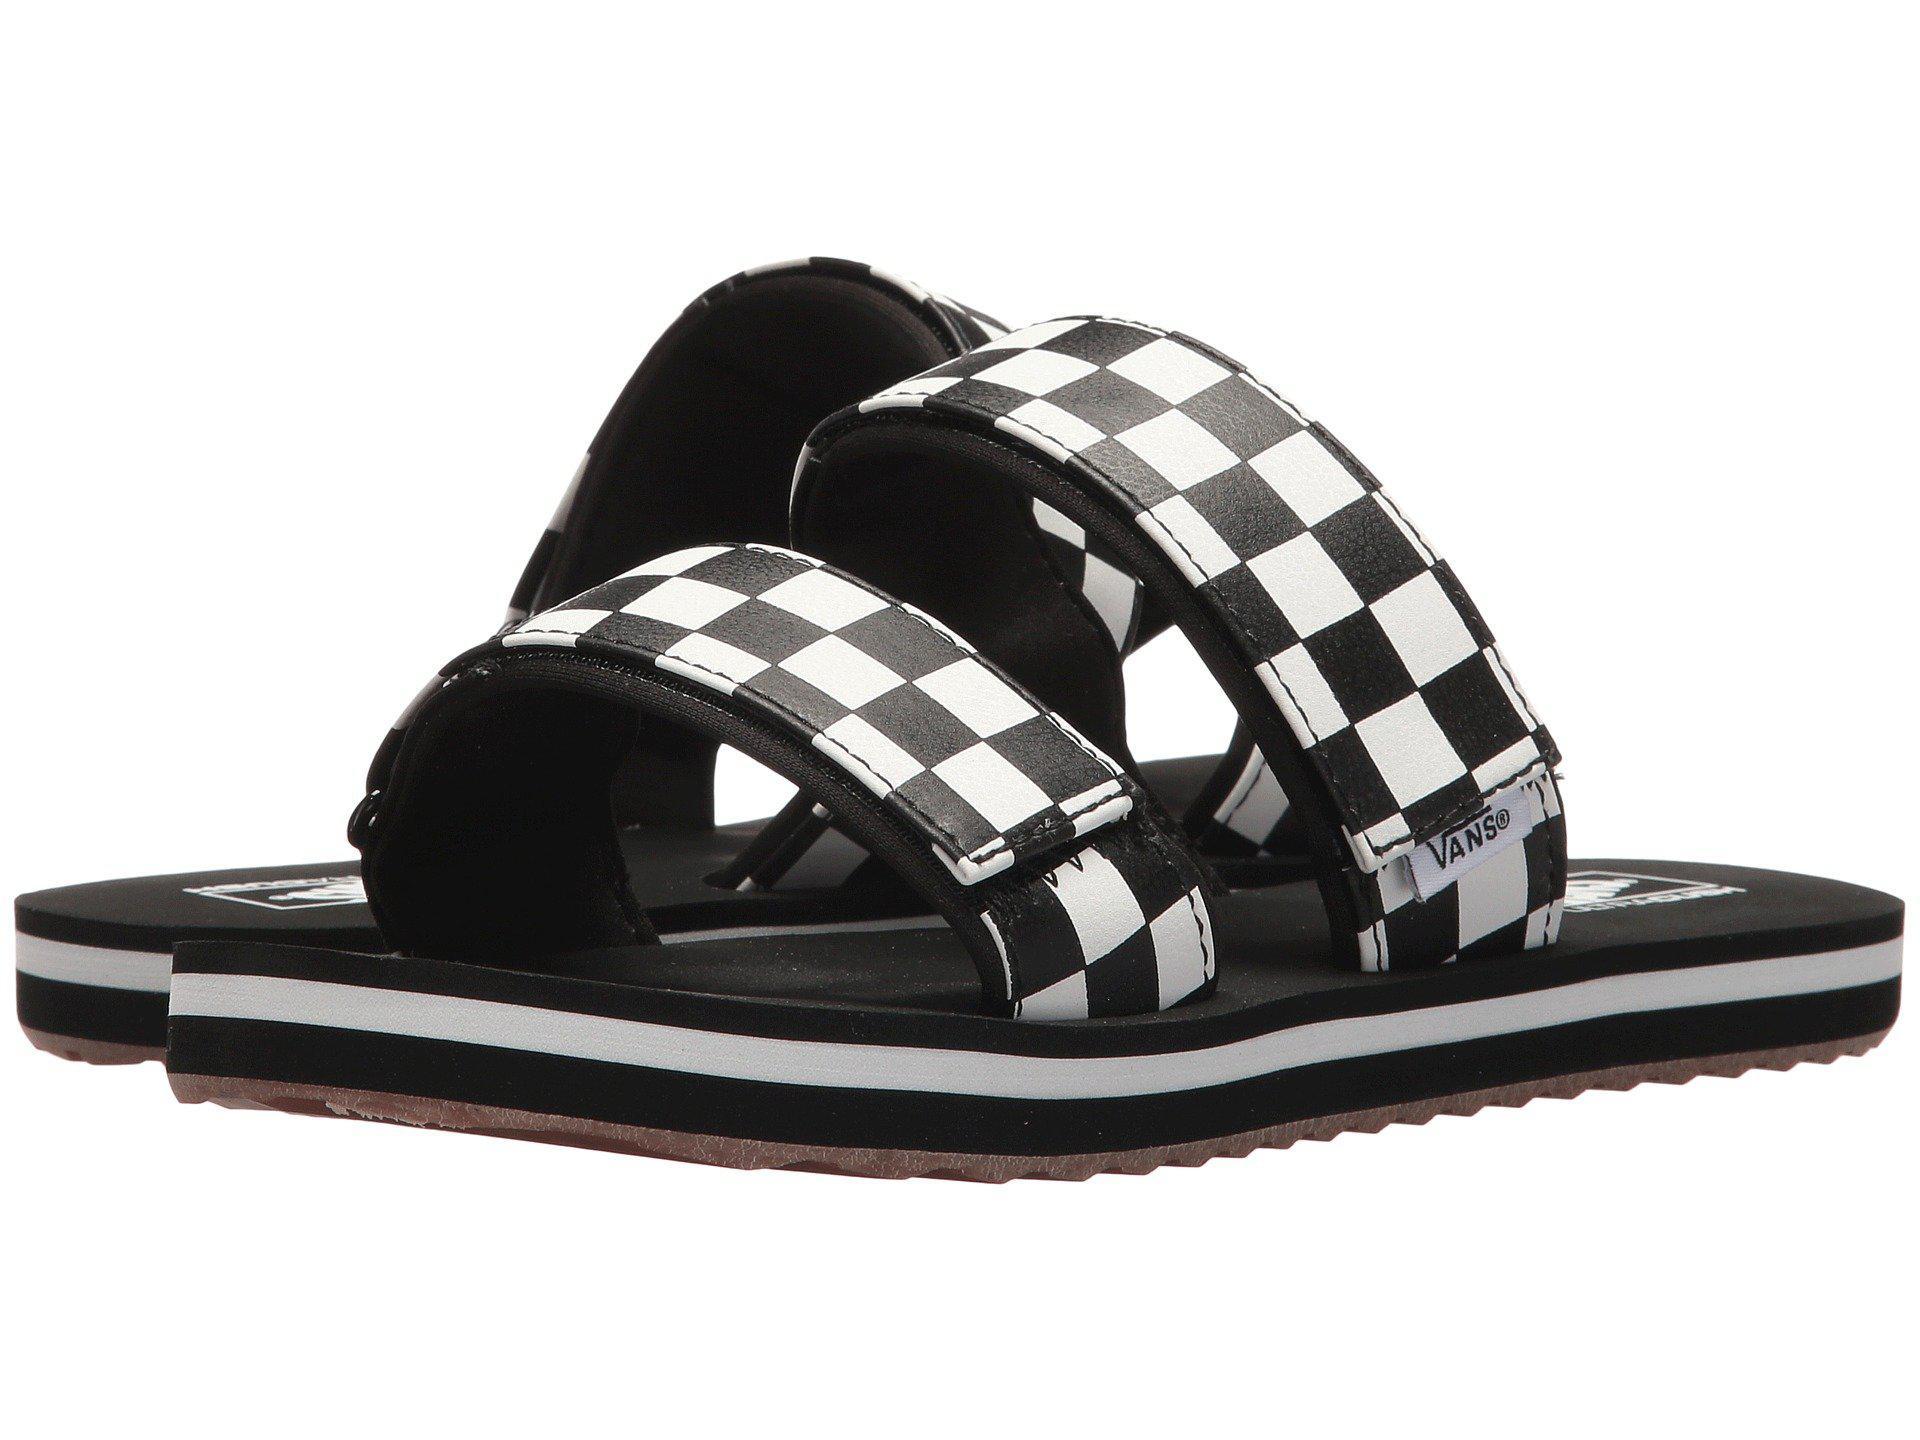 Lyst - Vans Cayucas Slide in Black 8daf98827